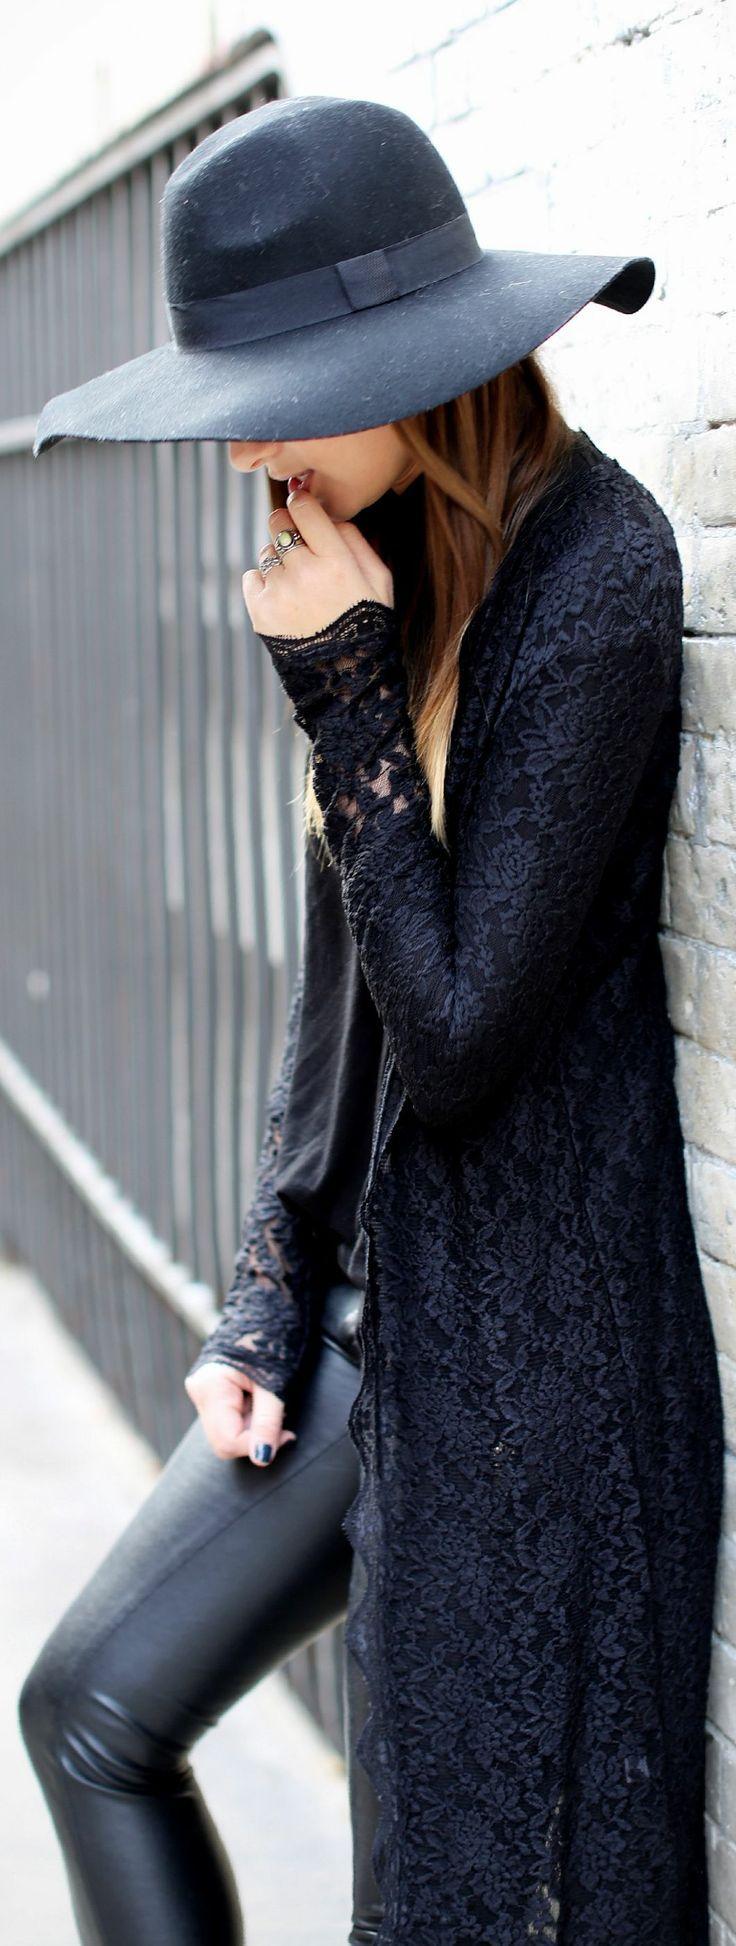 Leather pants lace coat with black hat